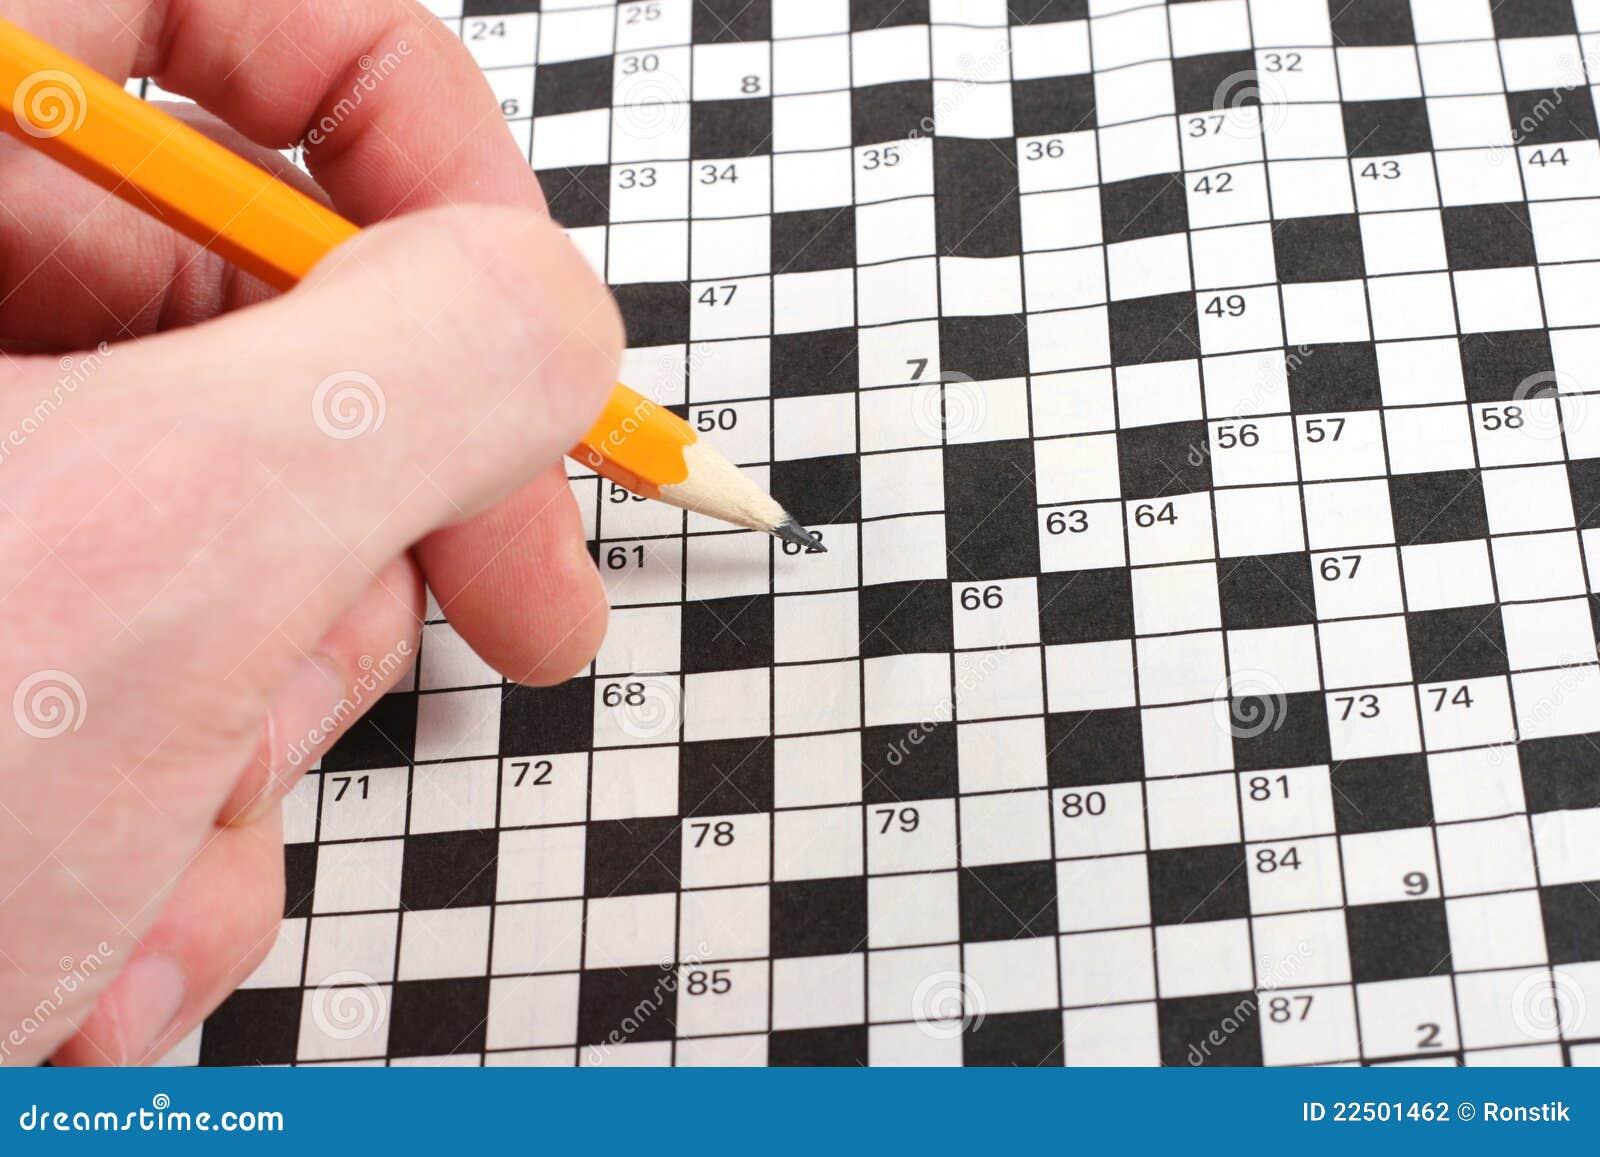 Hand Doing Crossword Stock Photography - Image: 22501462 - photo#41